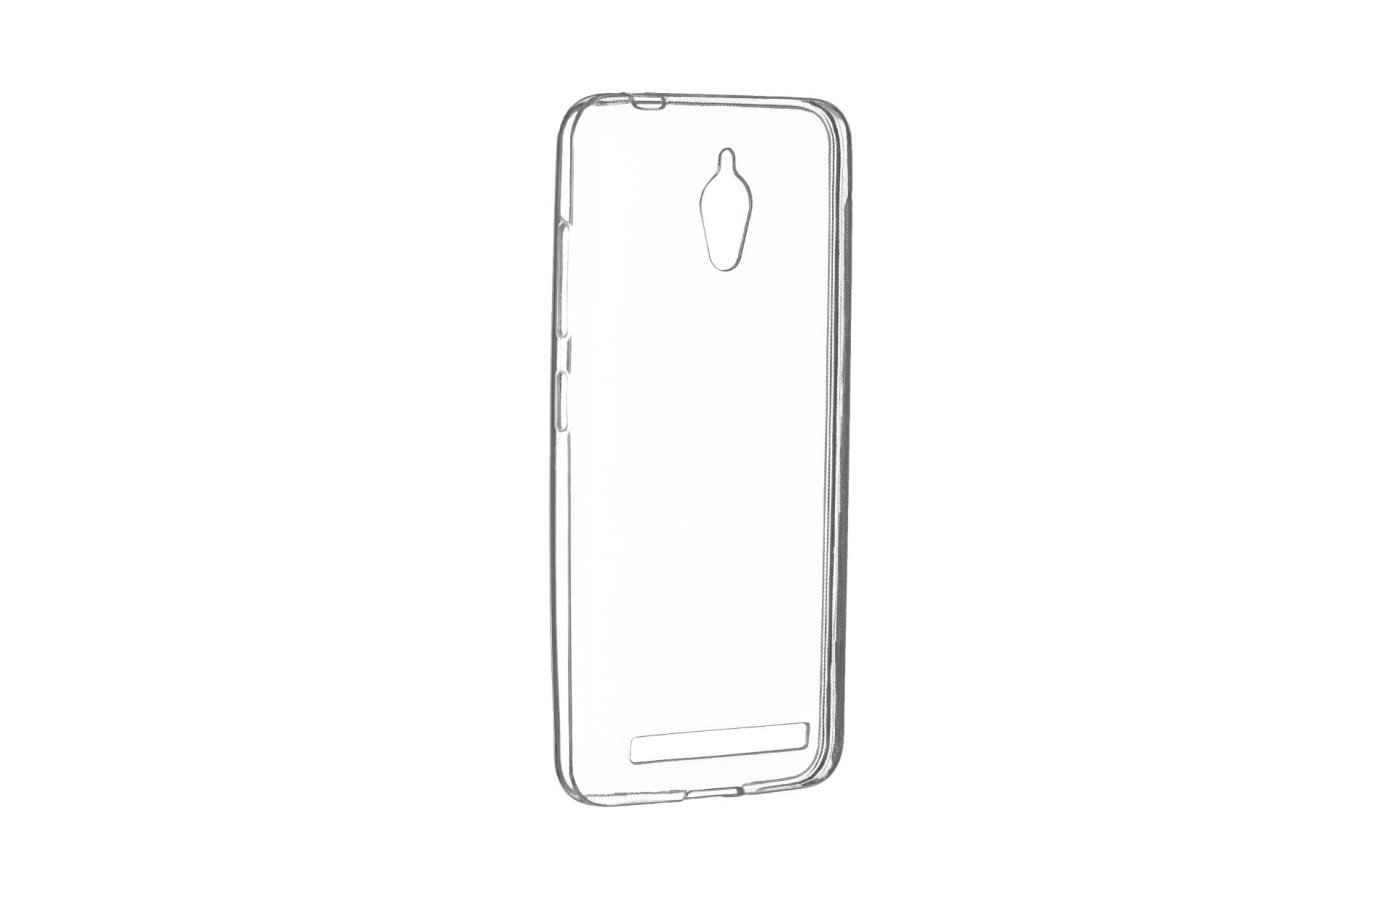 Чехол iBox Crystal для Asus ZenFone Go (ZC500TG) прозрачный